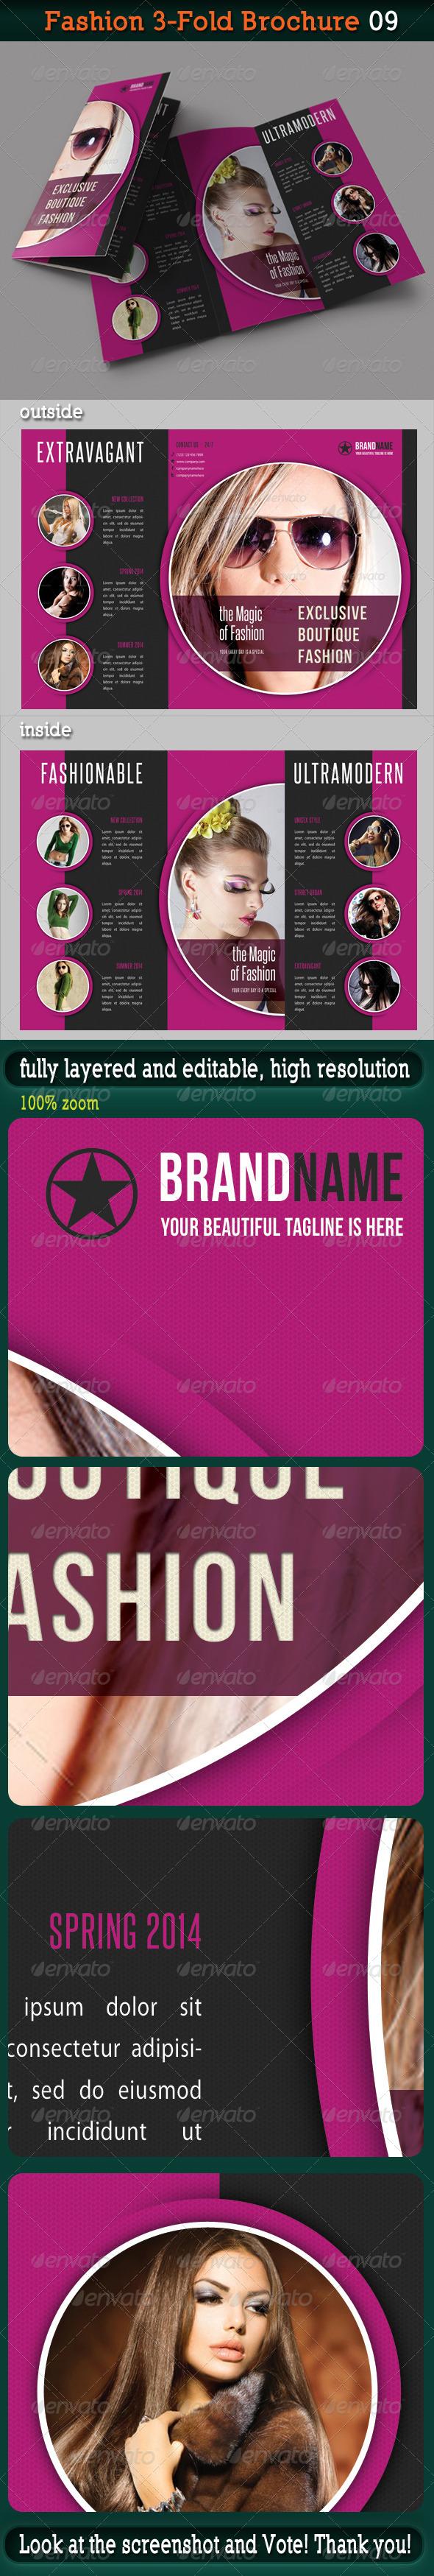 Fashion 3-Fold Brochure 09 - Catalogs Brochures